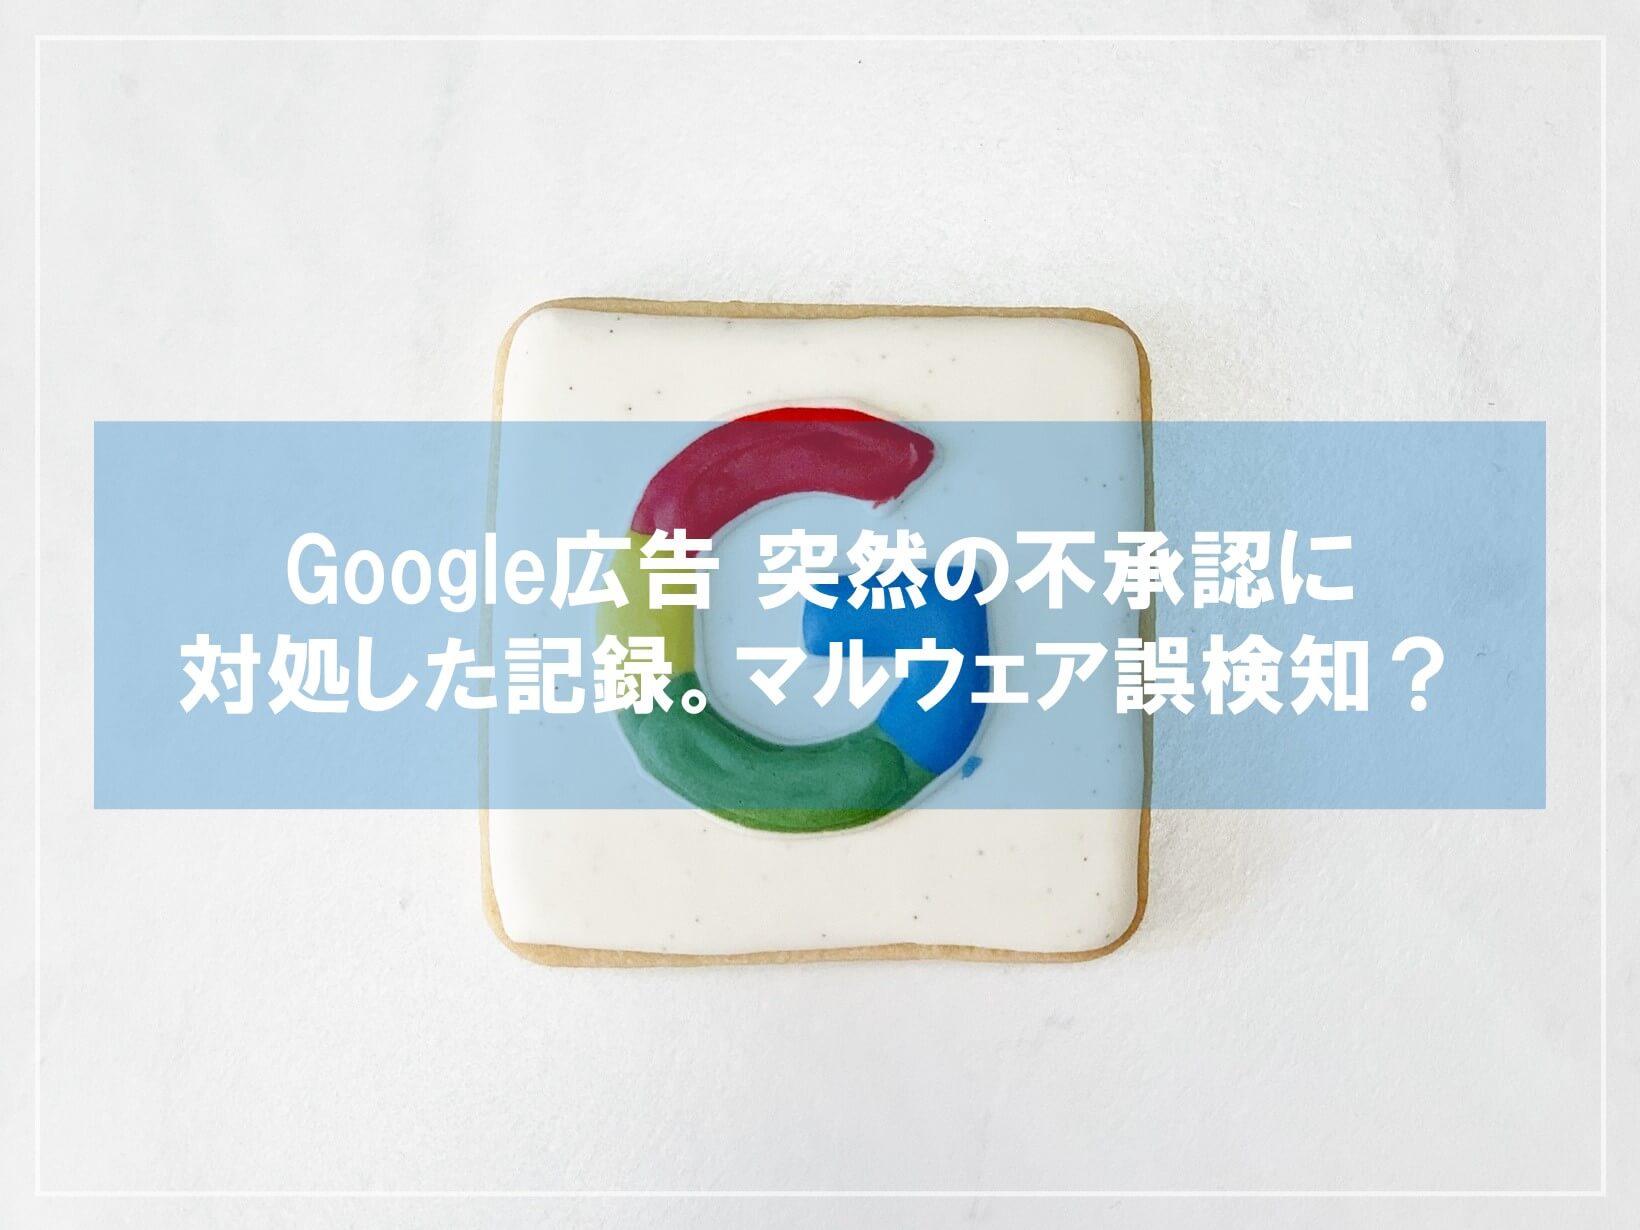 Google広告 突然の不承認に対処した記録【マルウェア誤検知?】